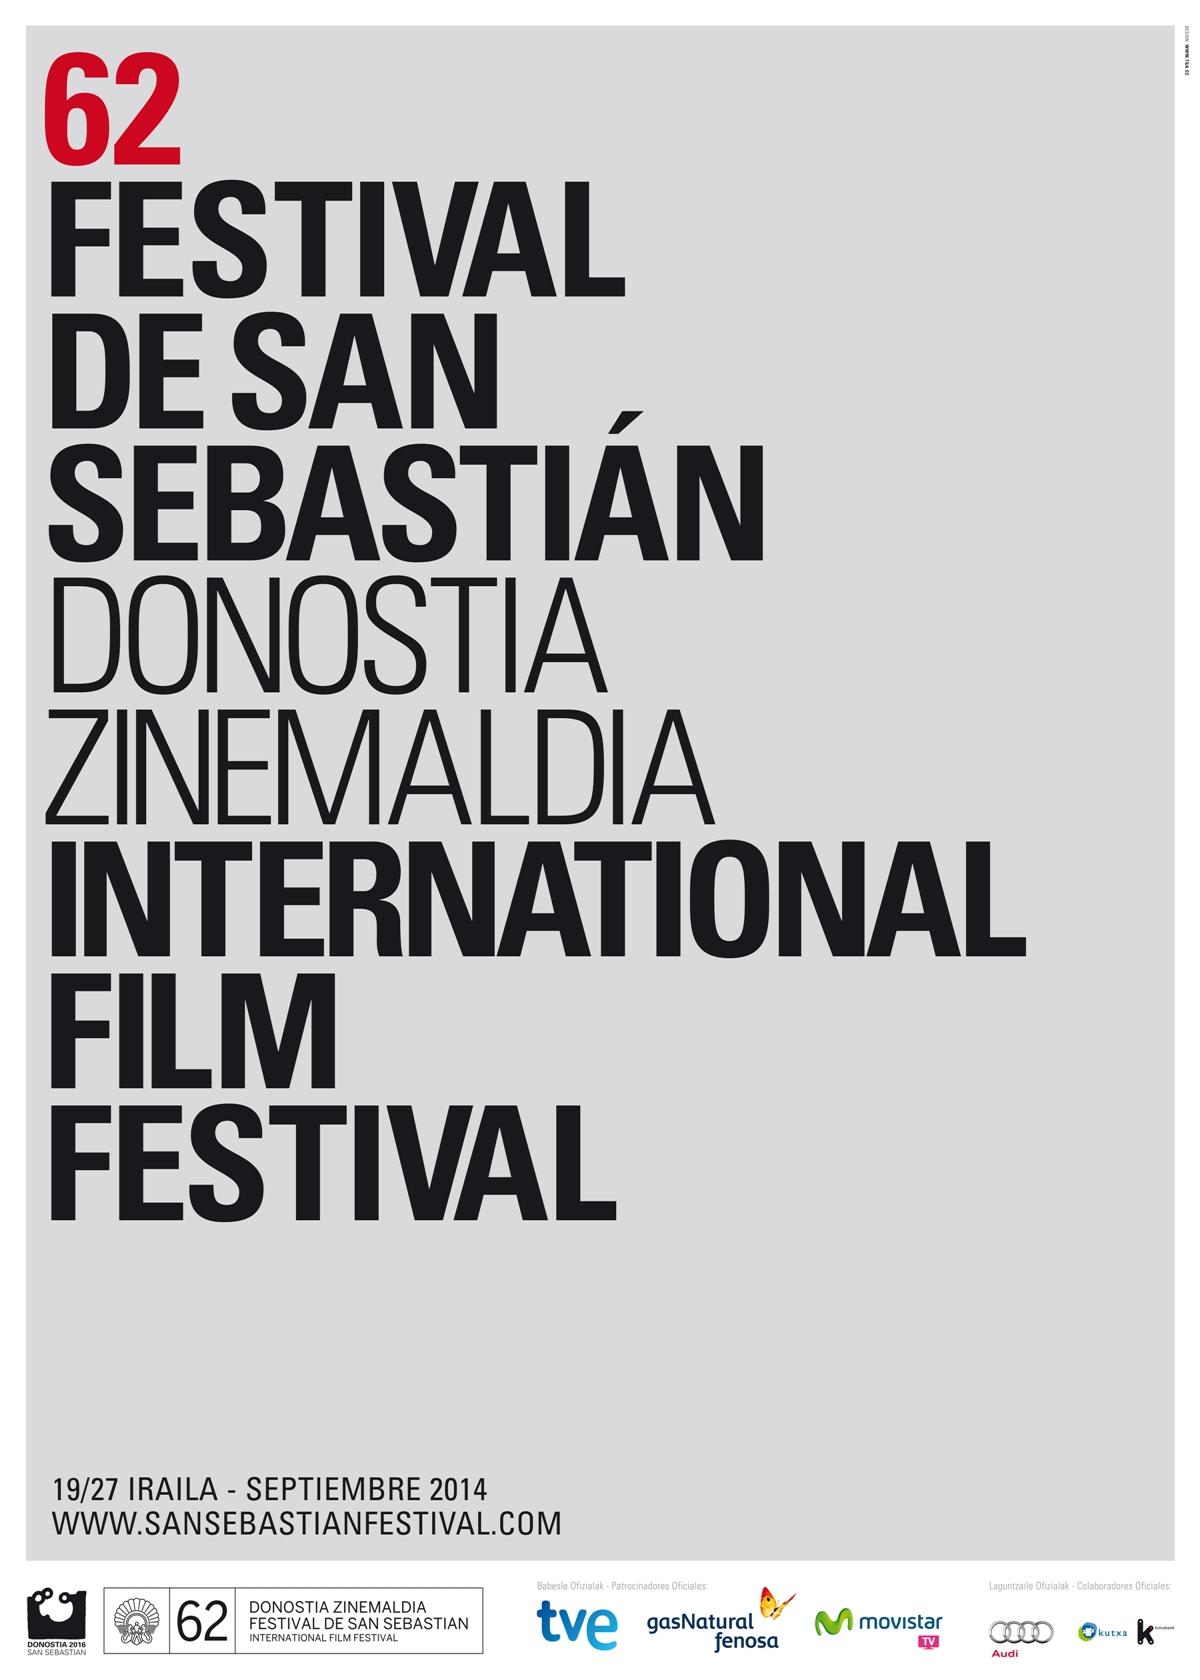 62 Festival de San Sebastián (Poster)